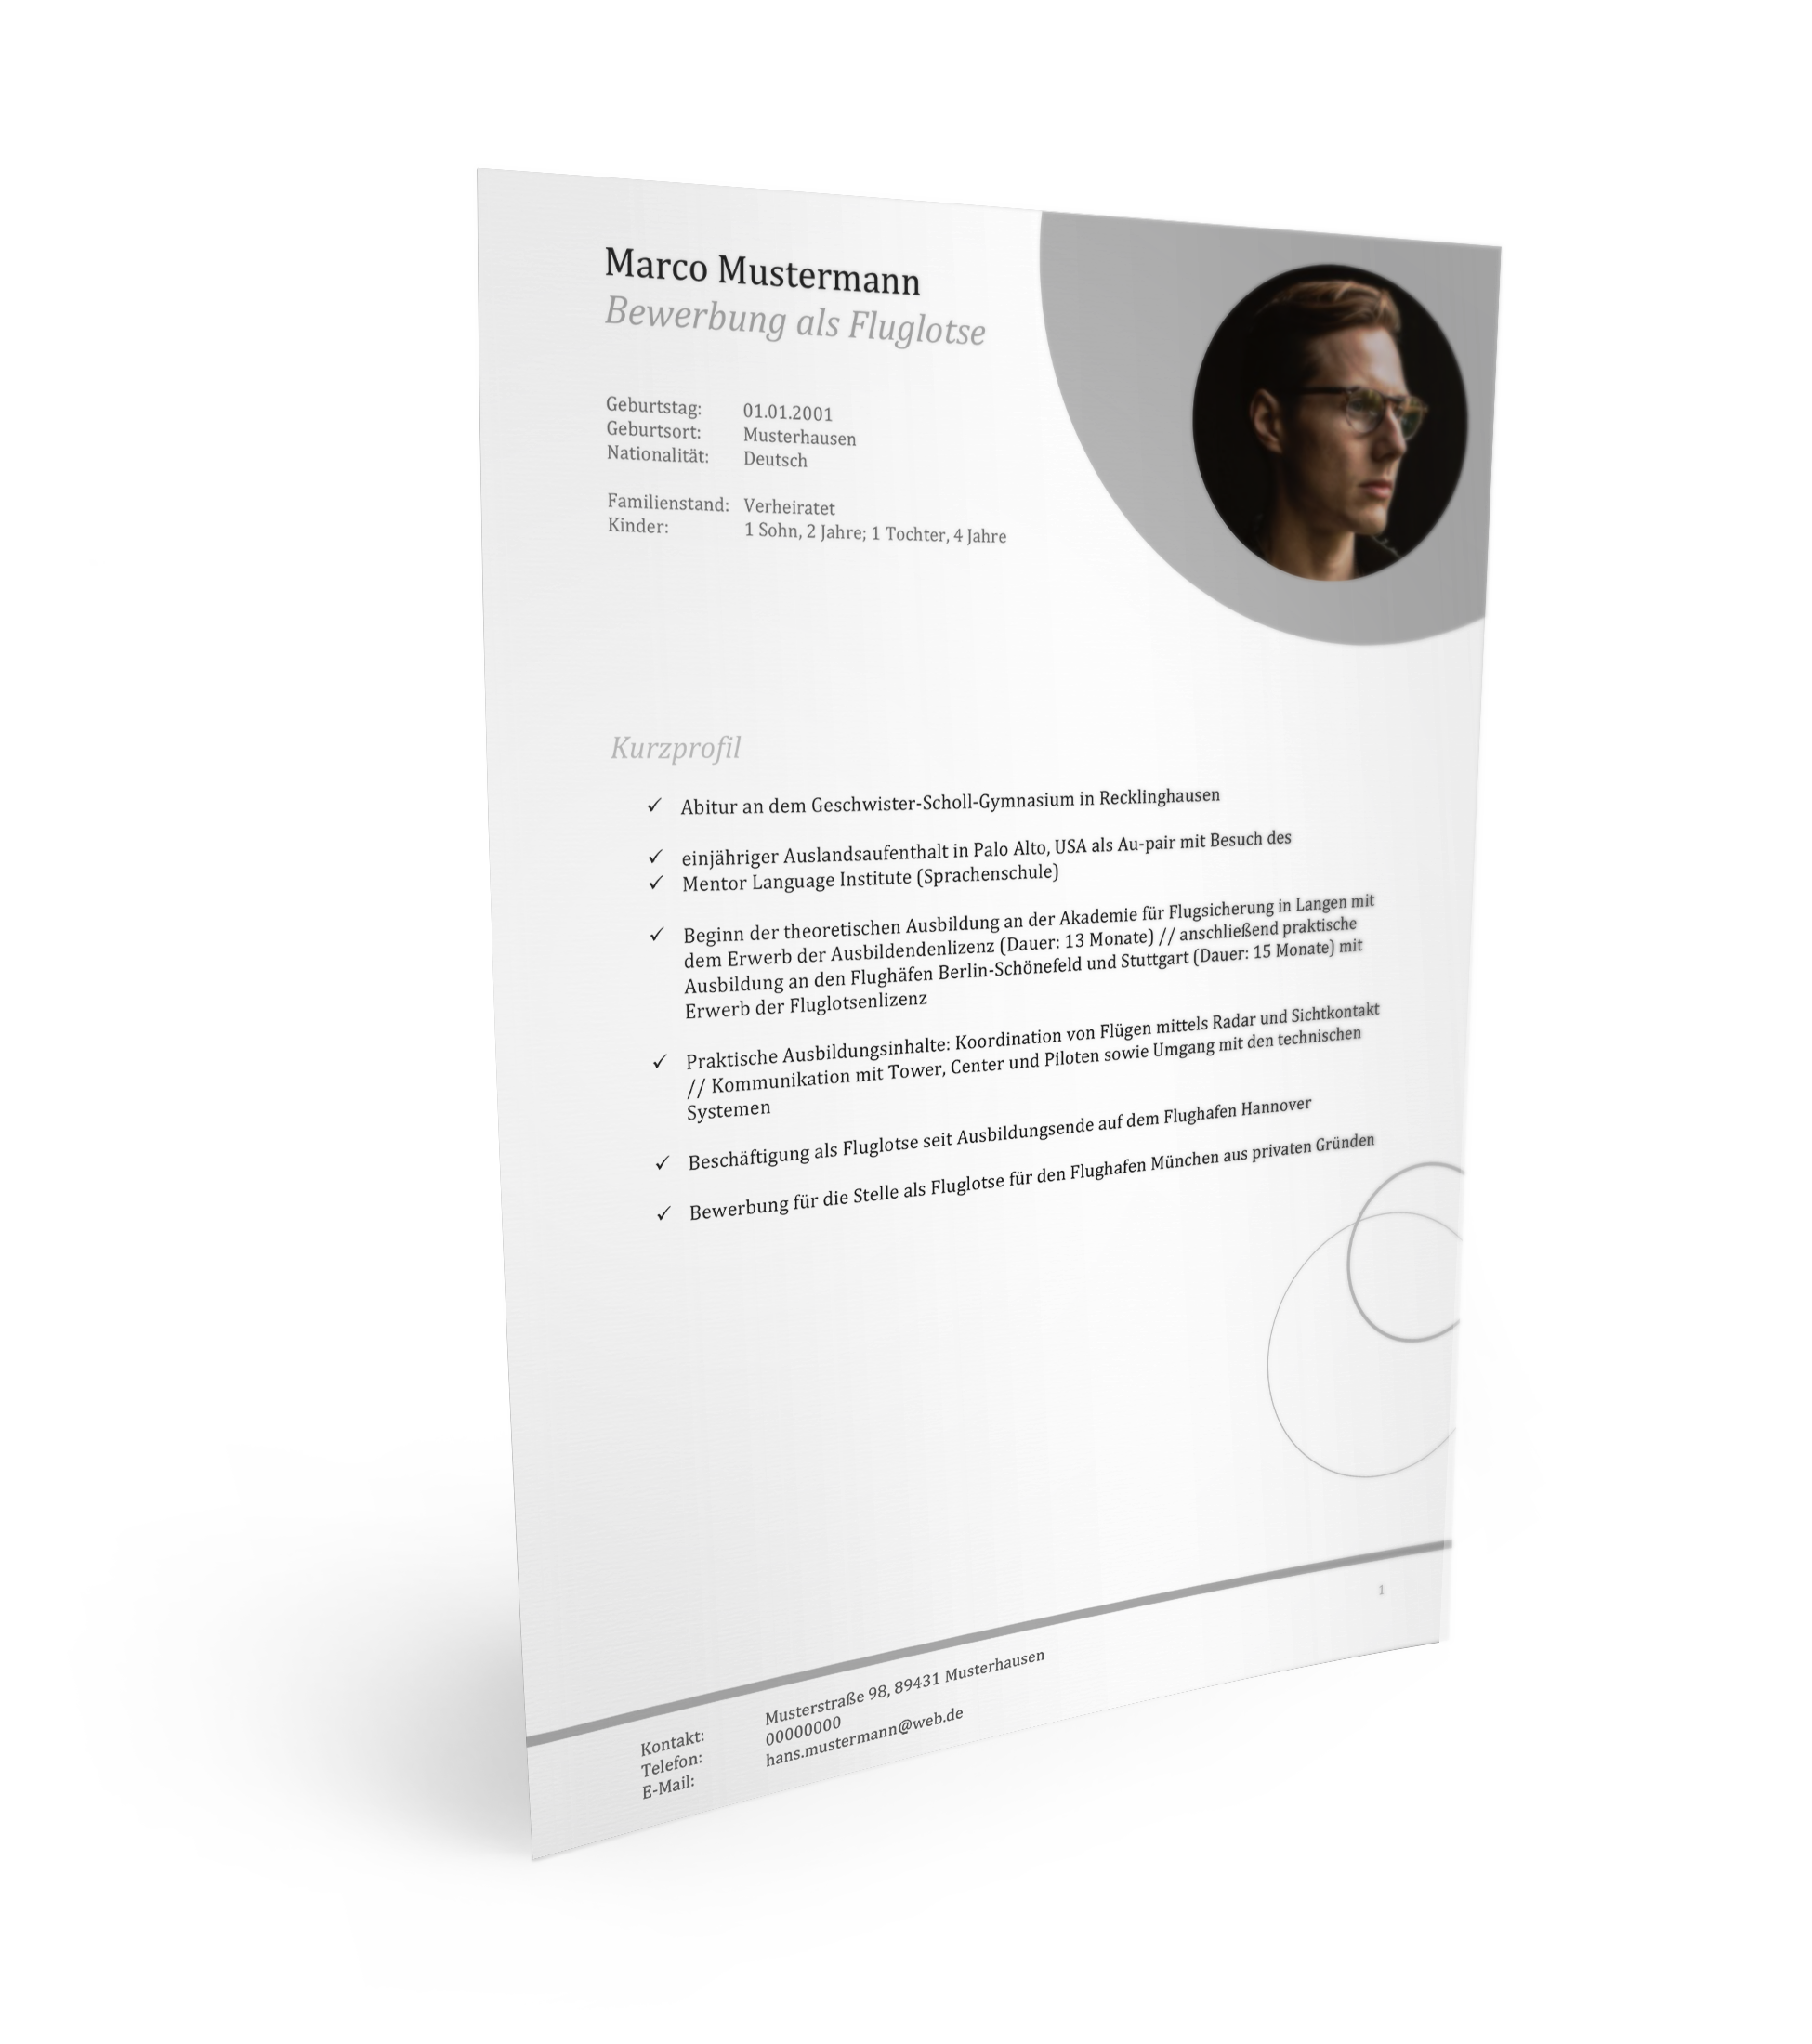 Berühmt Usa Jobs Lebenslauf Länge Fotos - Entry Level Resume ...